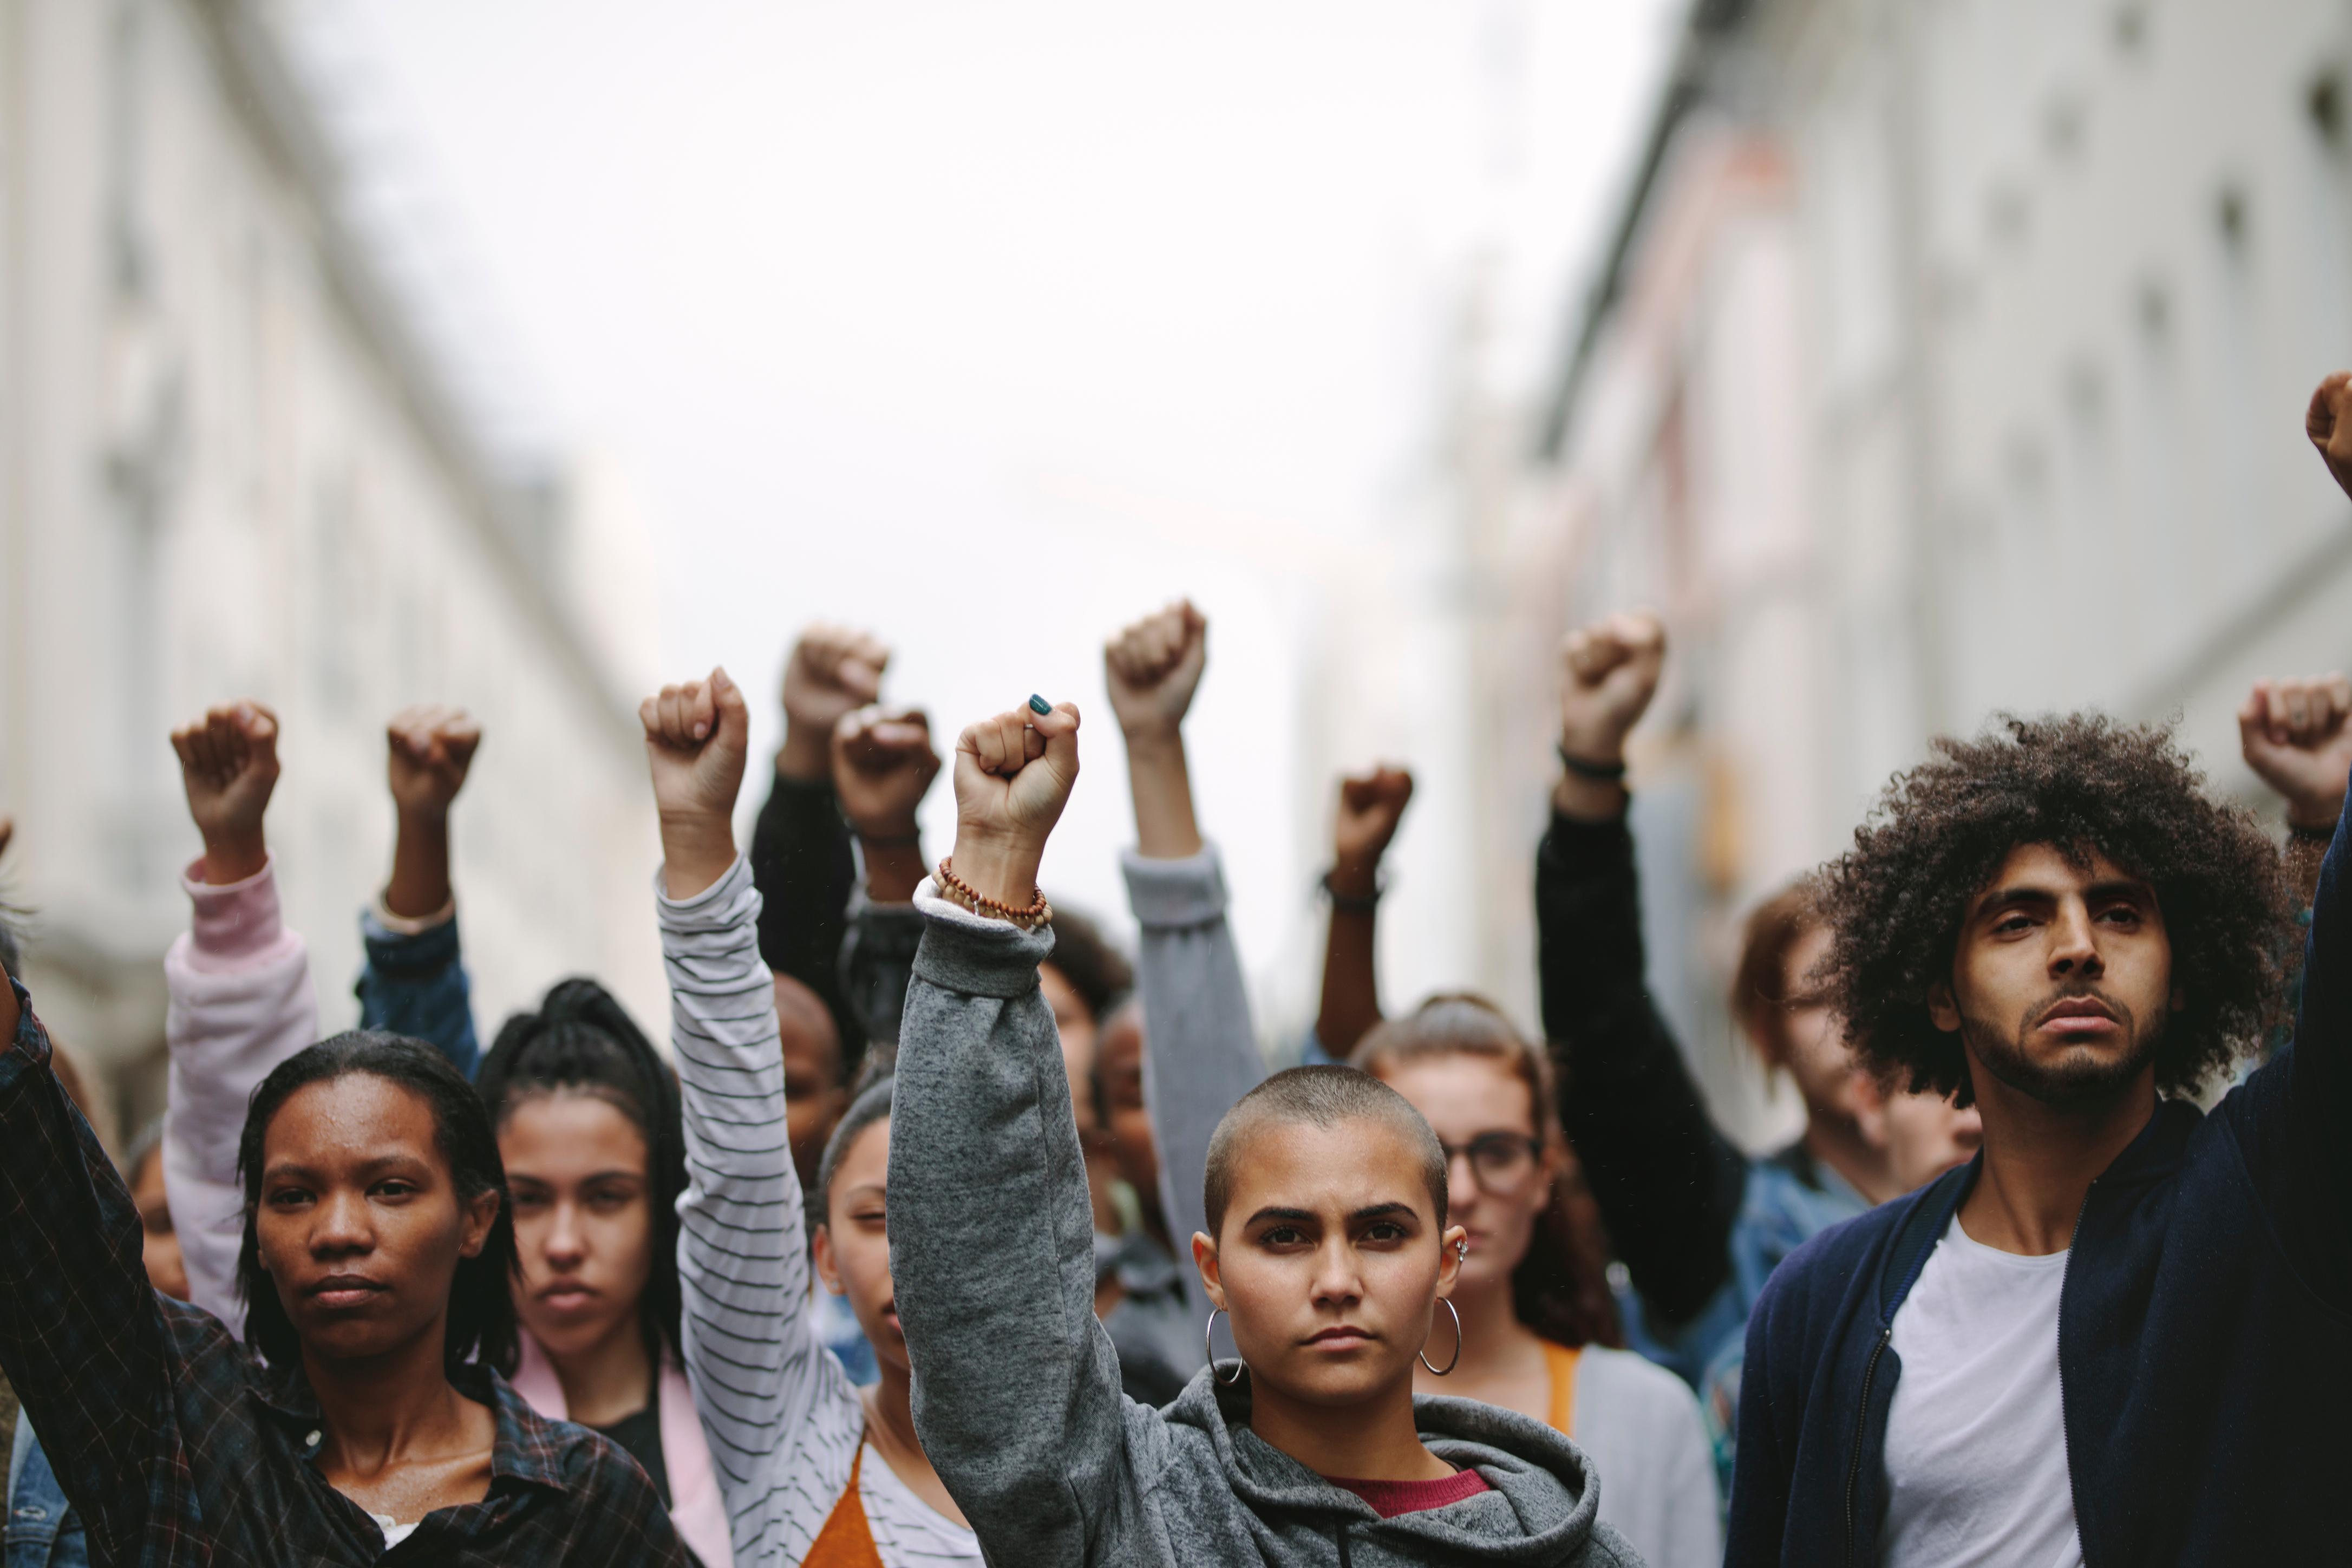 Protestors for social justice